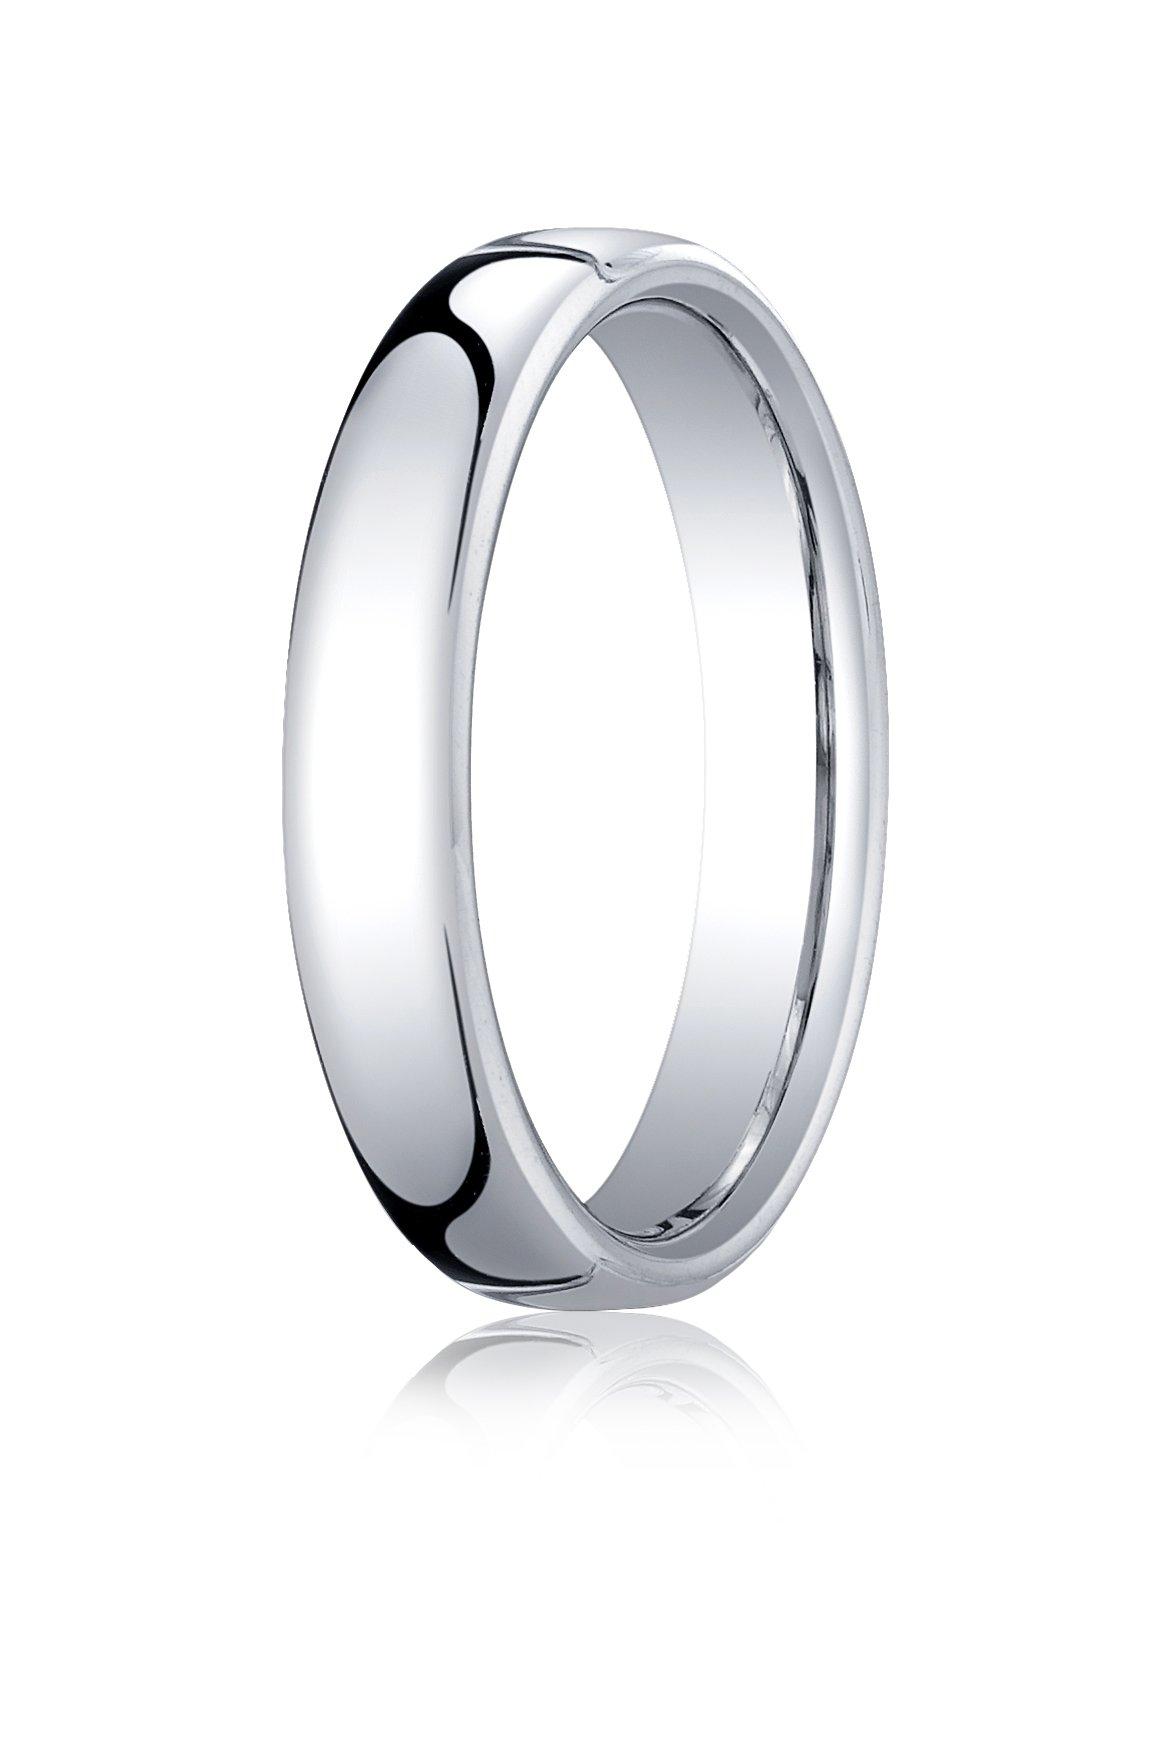 Mens Platinum, 4.5mm London Couture Comfort-Fit Ring (sz 7.5)